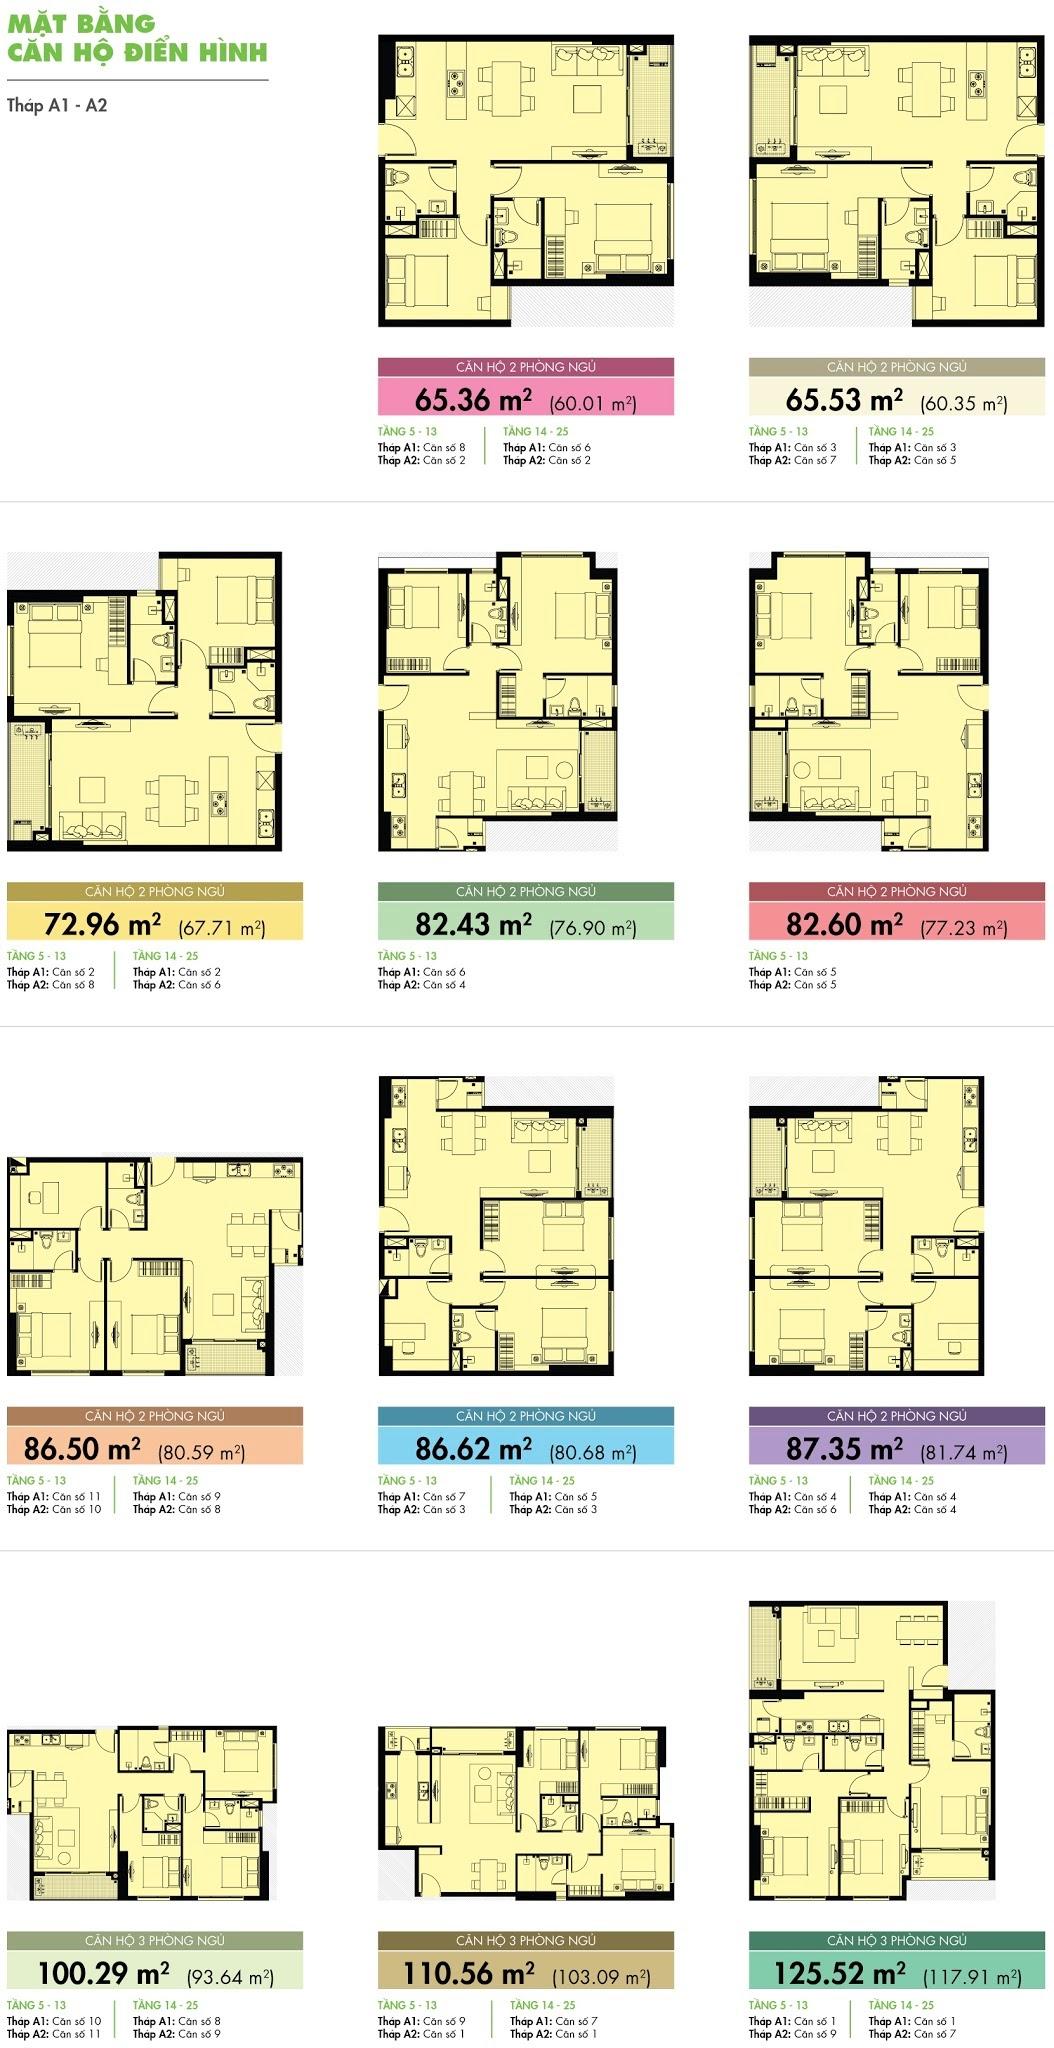 Mặt căn hộ Tropic Garden block A1 & A2